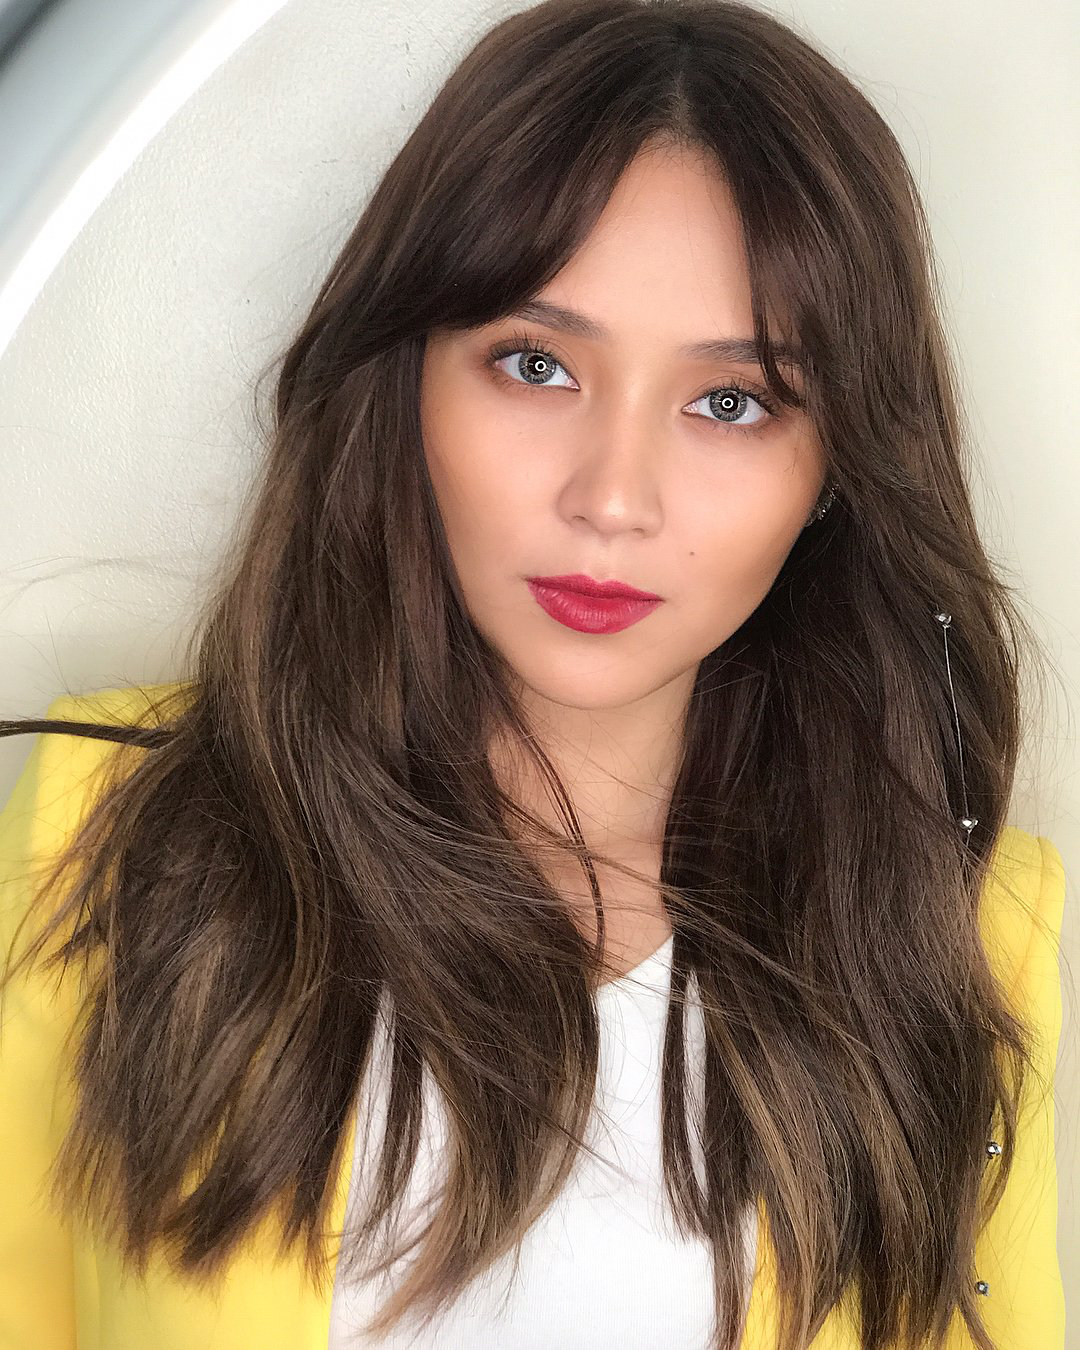 Kathrynbernardo Hair Color For Morena Hair Color Asian Hair Color For Morena Skin